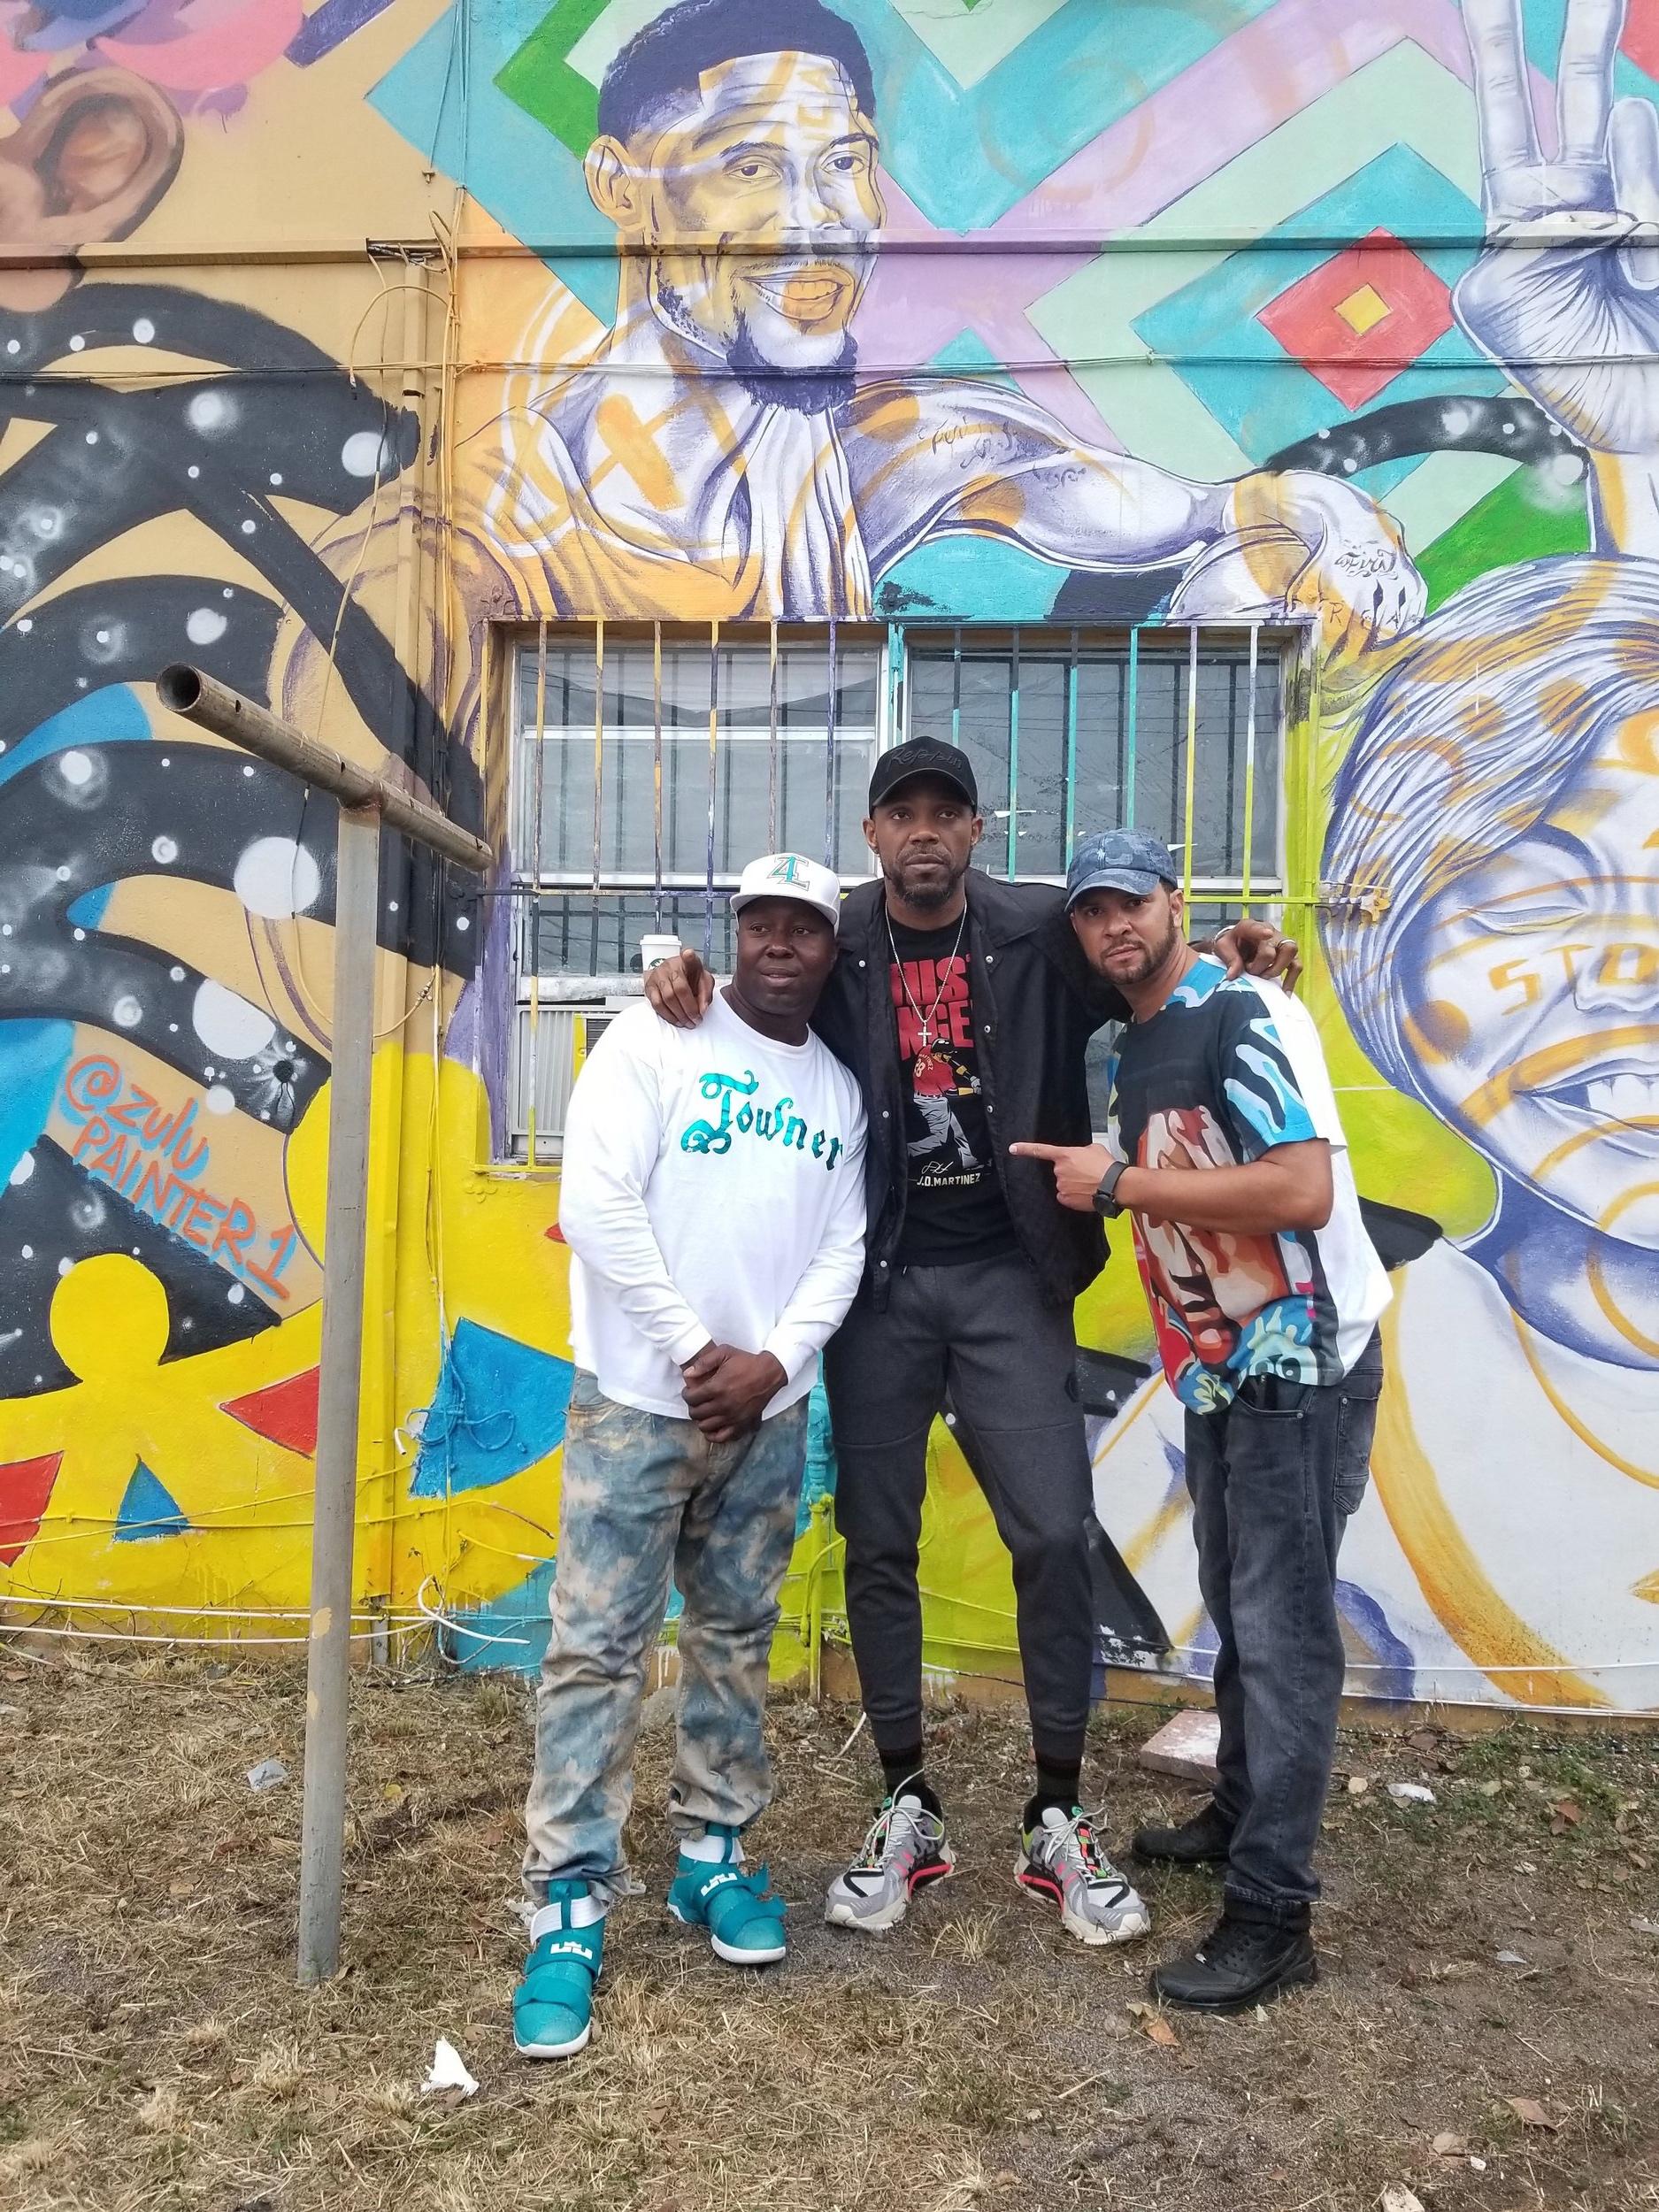 Buckwheat, Udonis Haslem and Kyle Holbrook